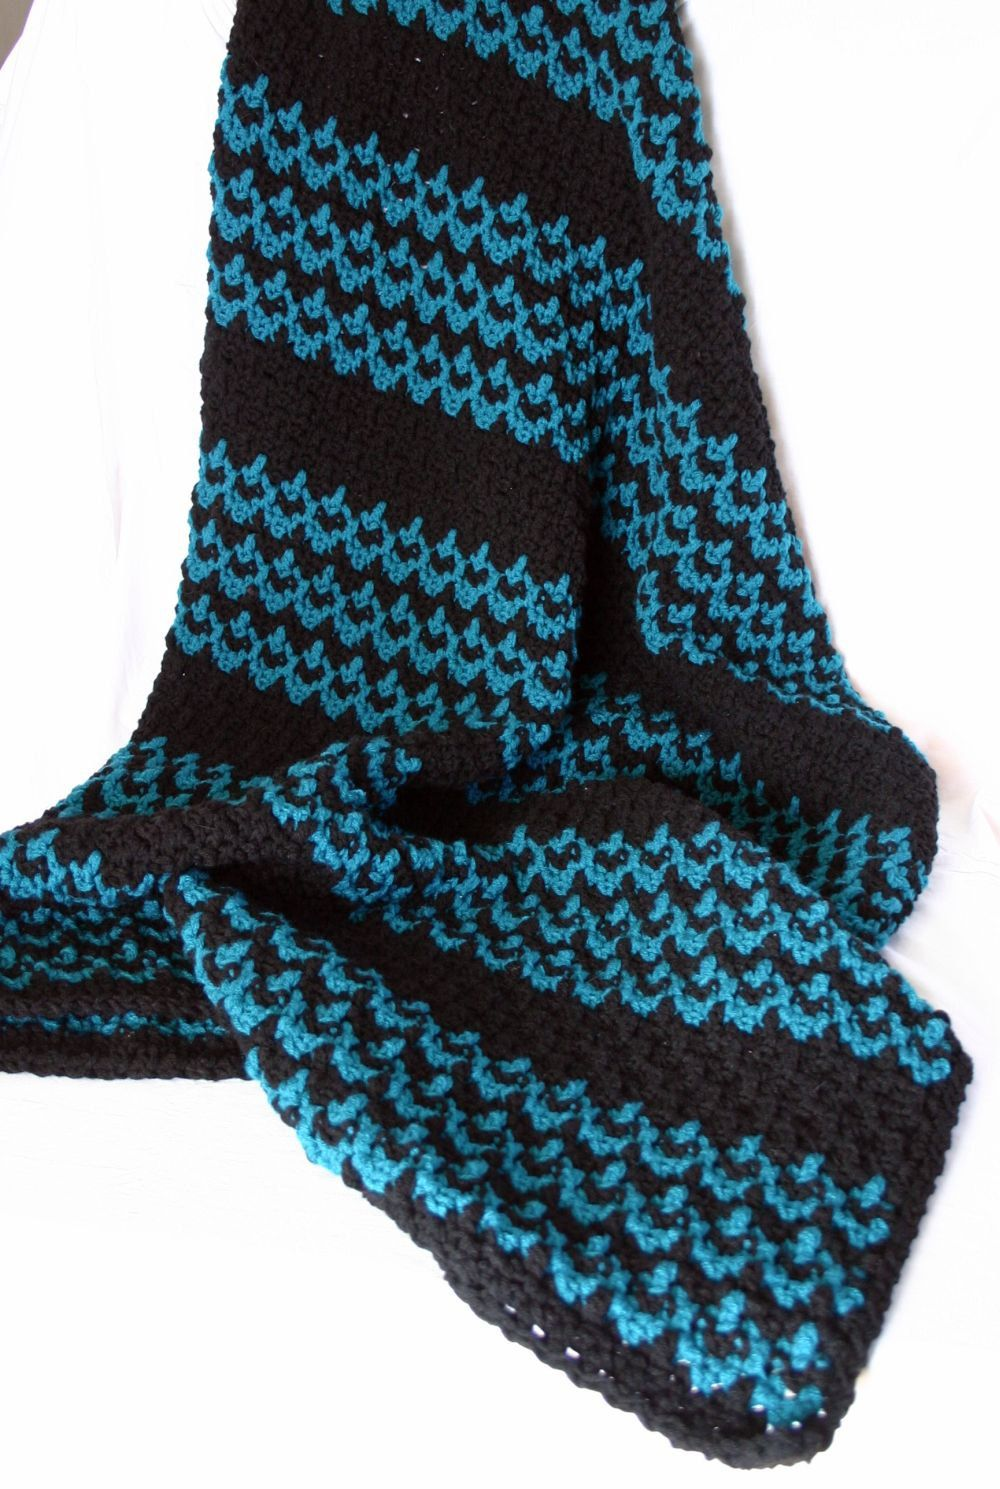 Crochet Afghan Teal Black Double Stranded Zig Zag Stripe Blanket